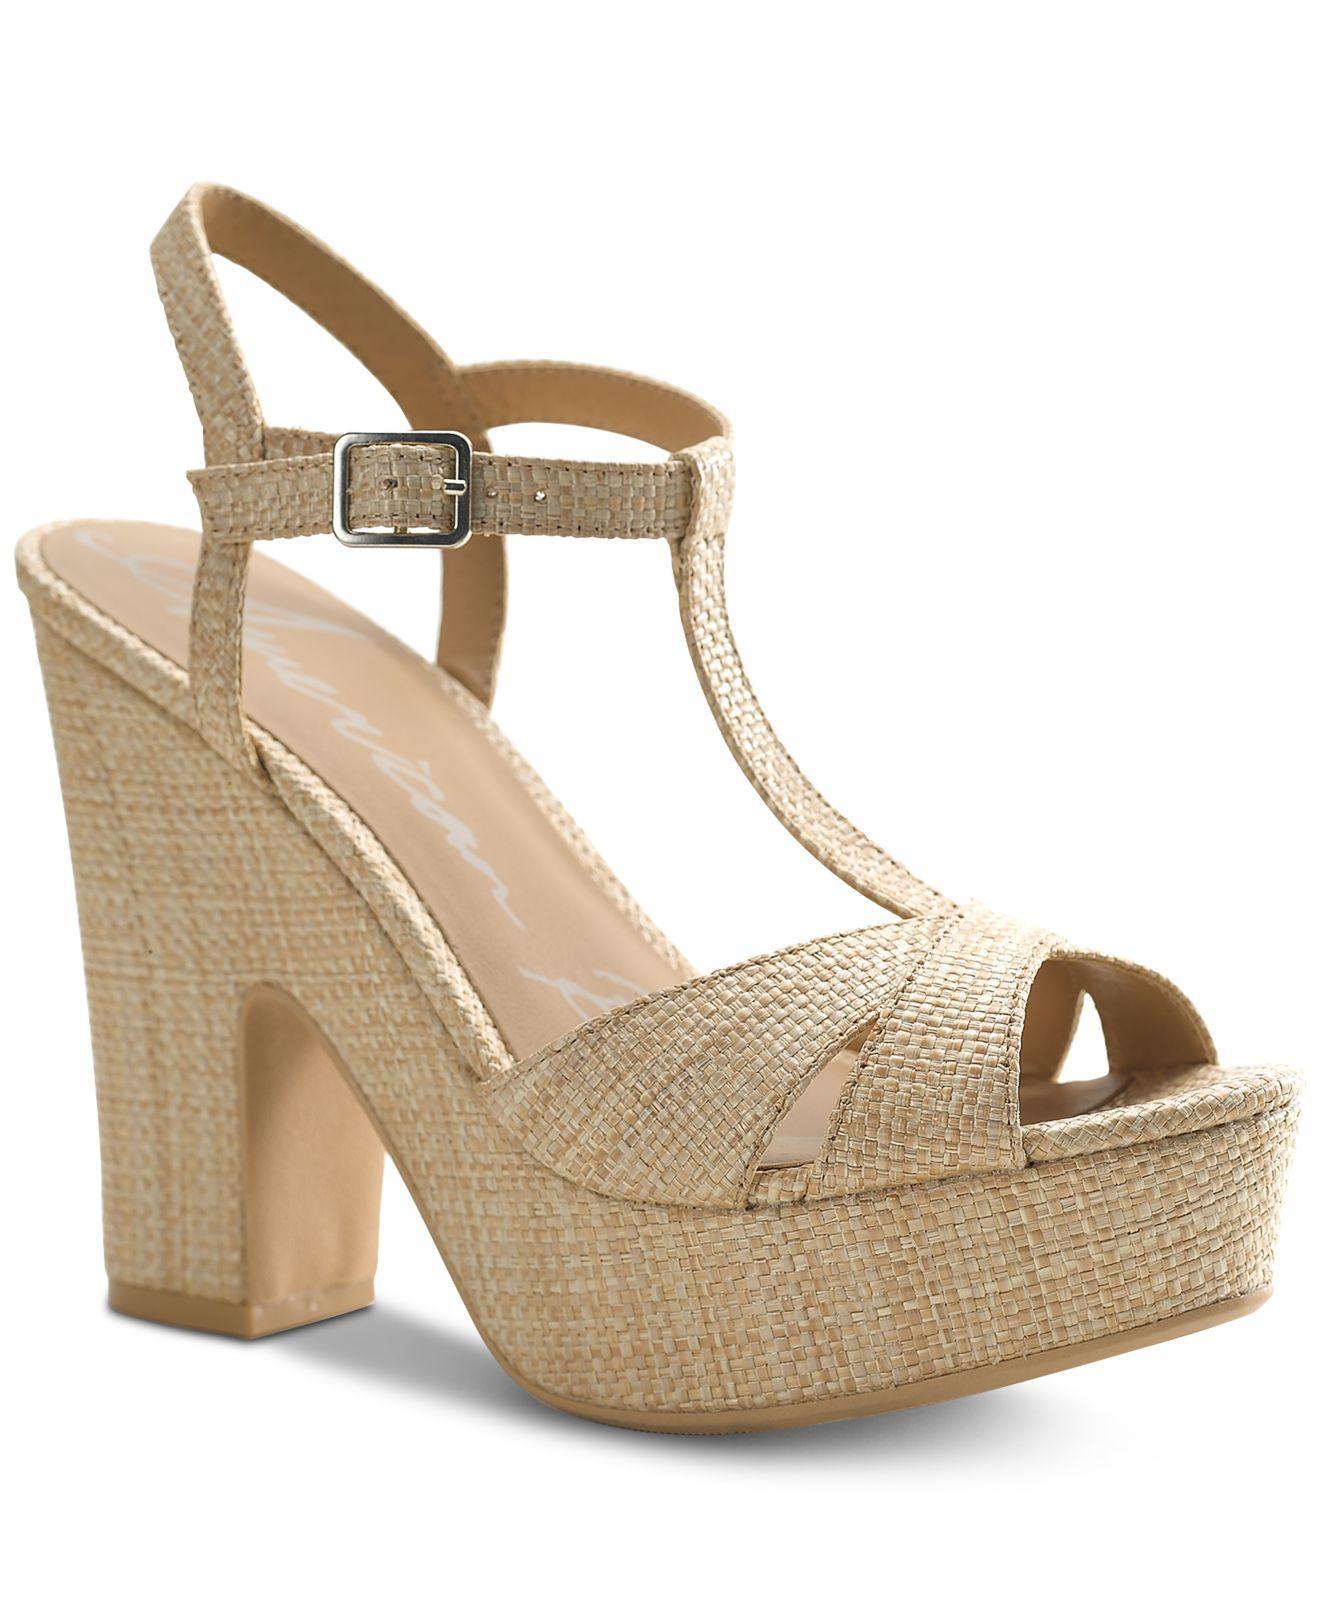 2d5cd40efb52 American Rag. Women s Natural Jamie T-strap Platform Dress Sandals ...